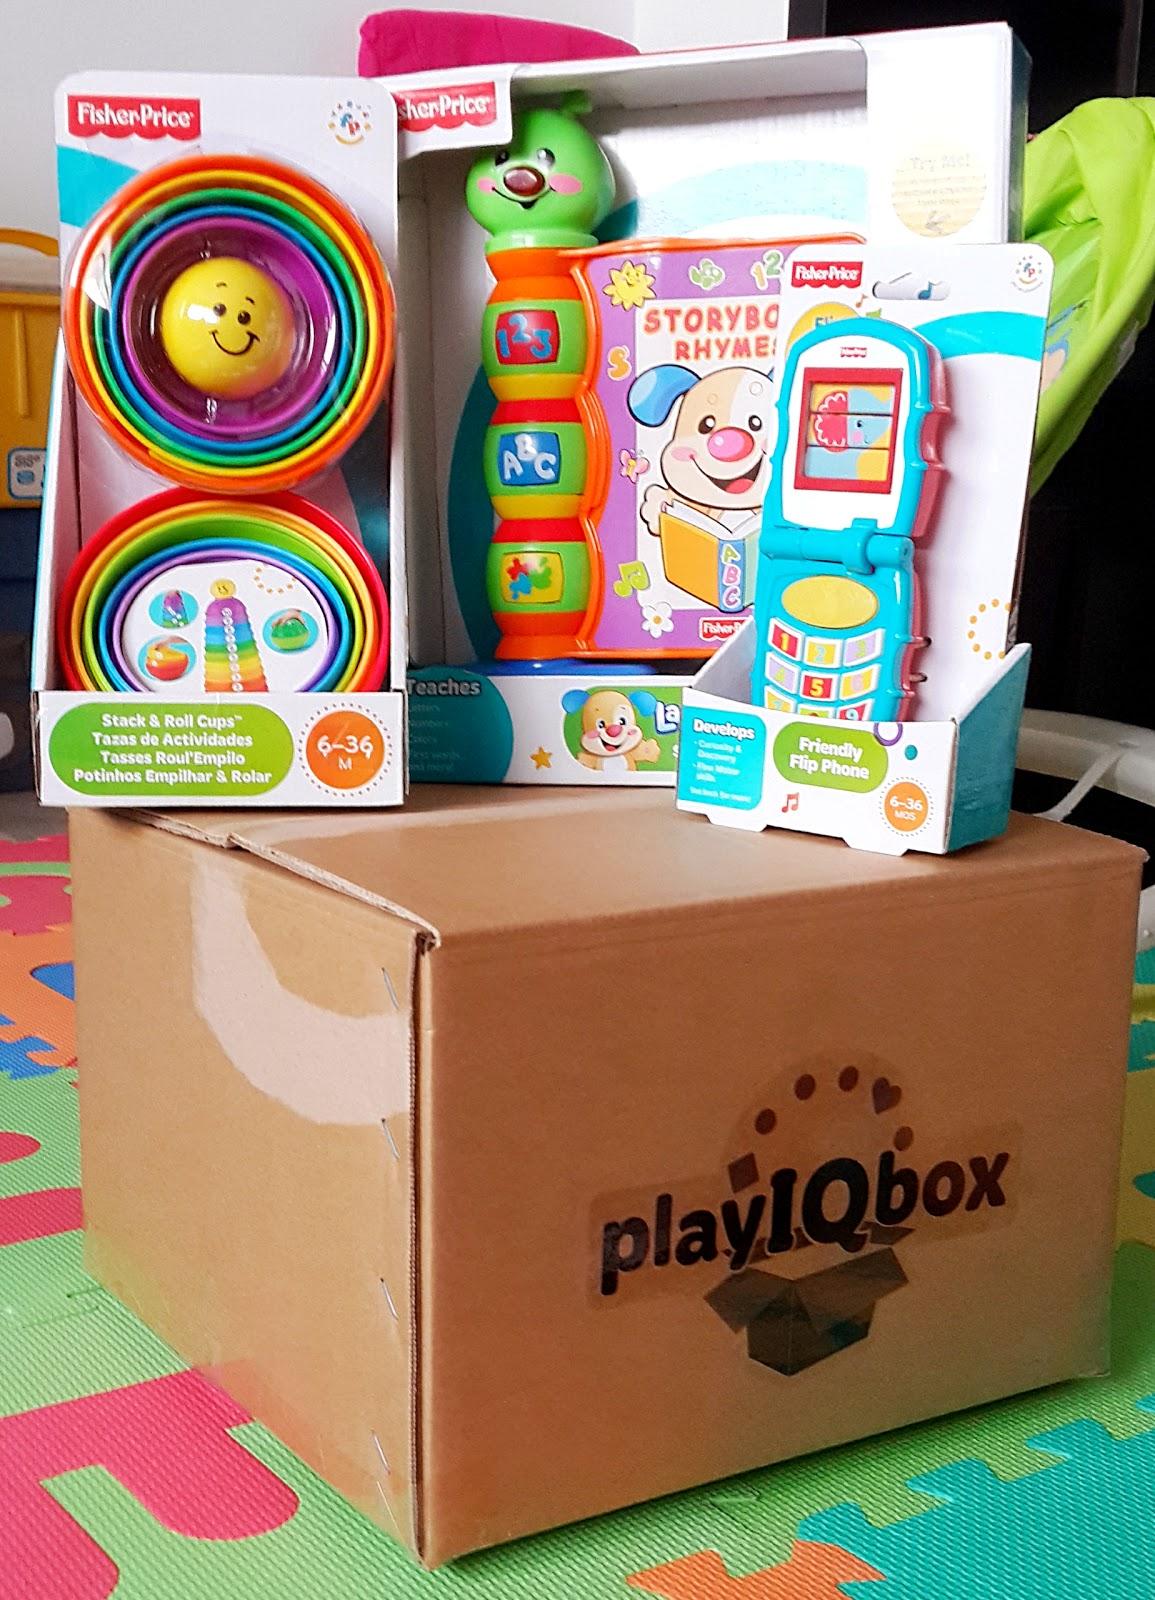 play IQ box